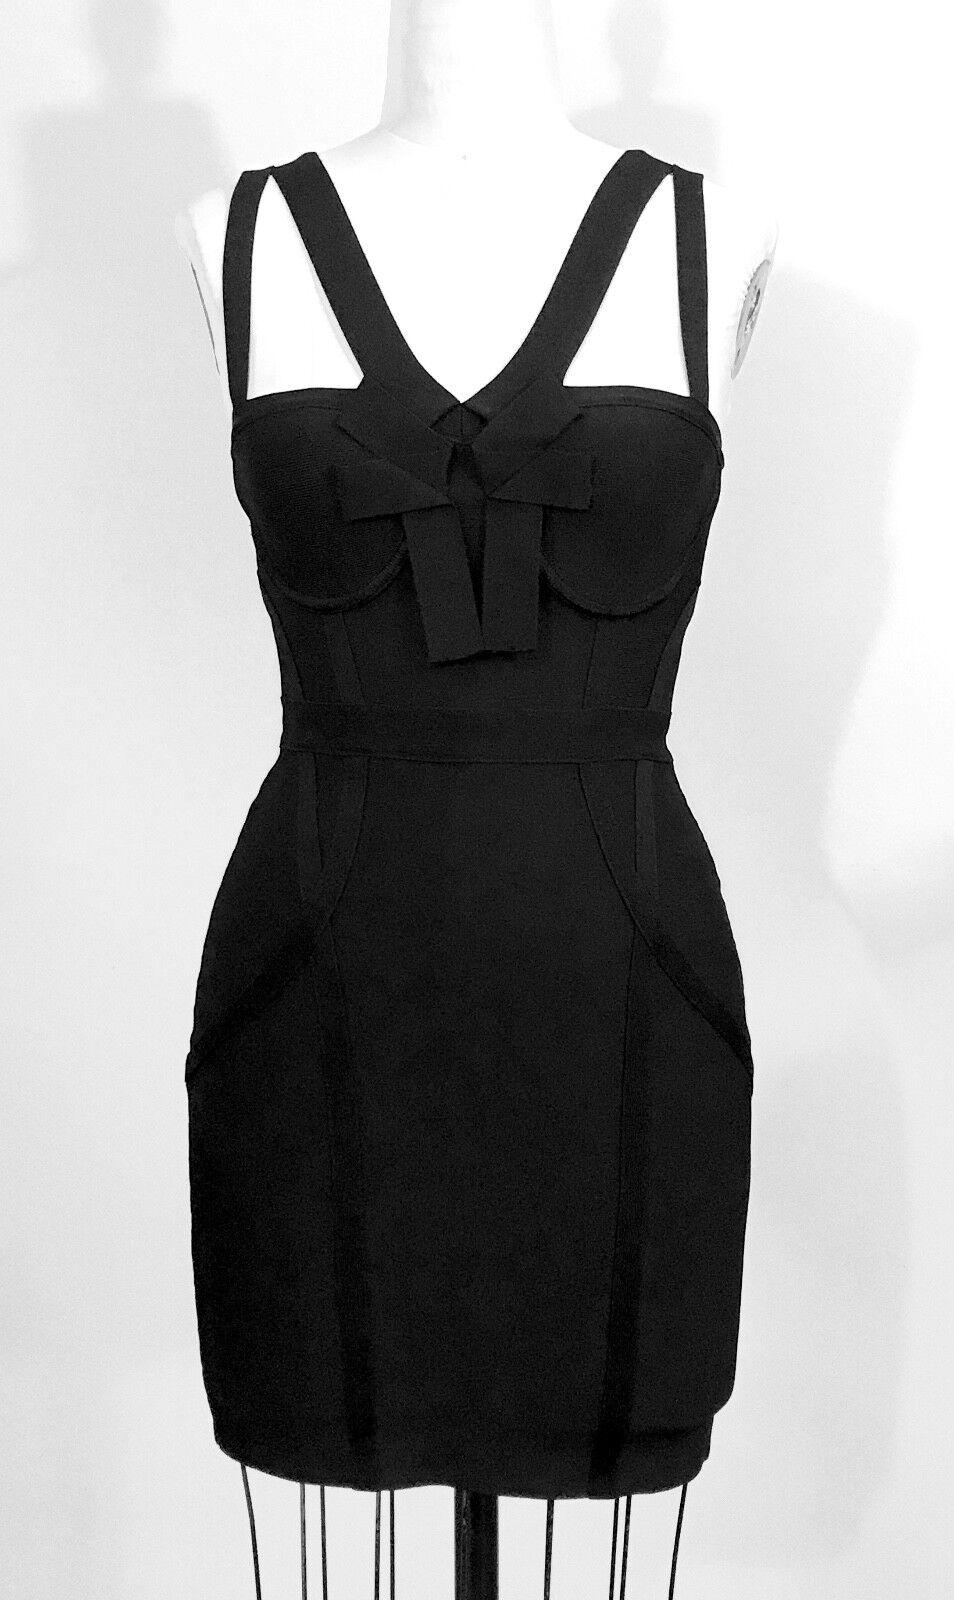 Bebe Bustier Origami schwarz Bandage Dress Größe S